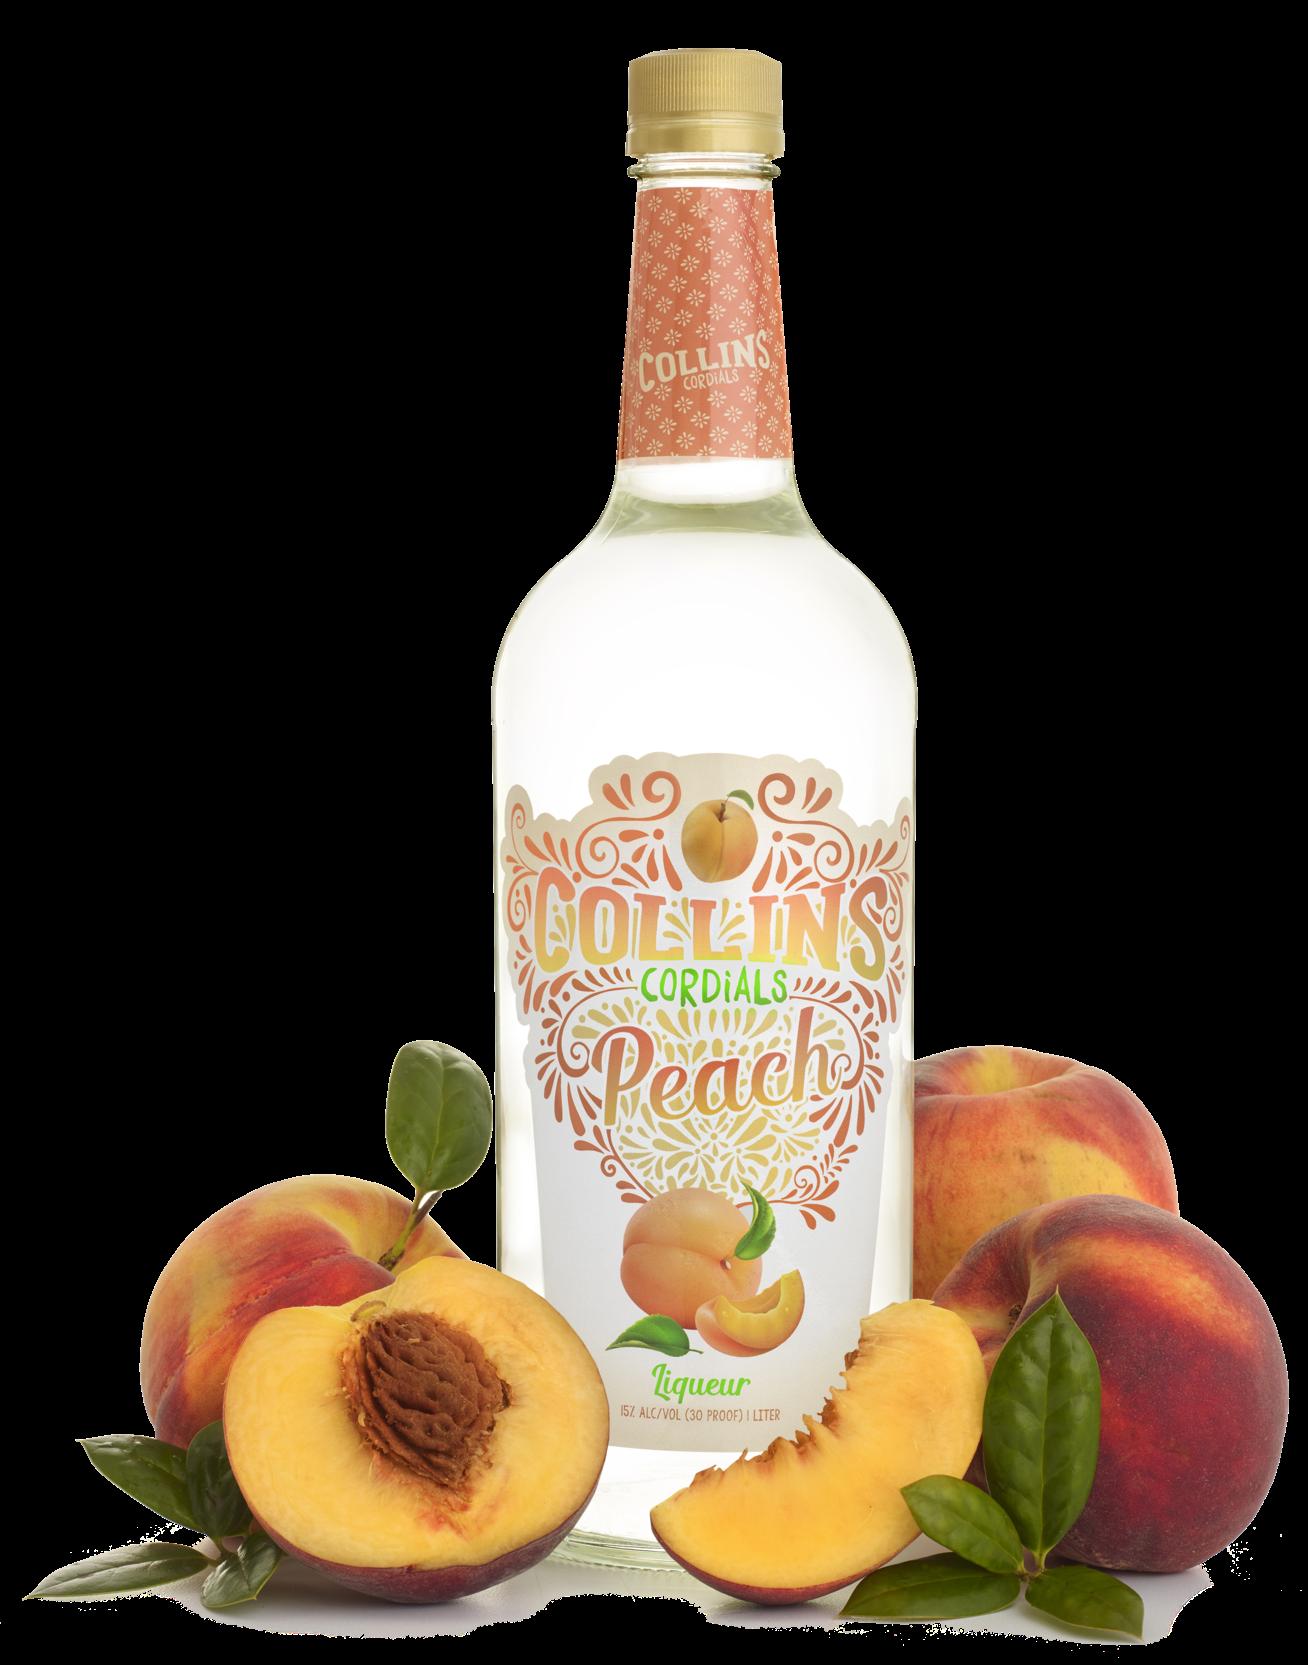 Peach Liqueur | Collins Cordials